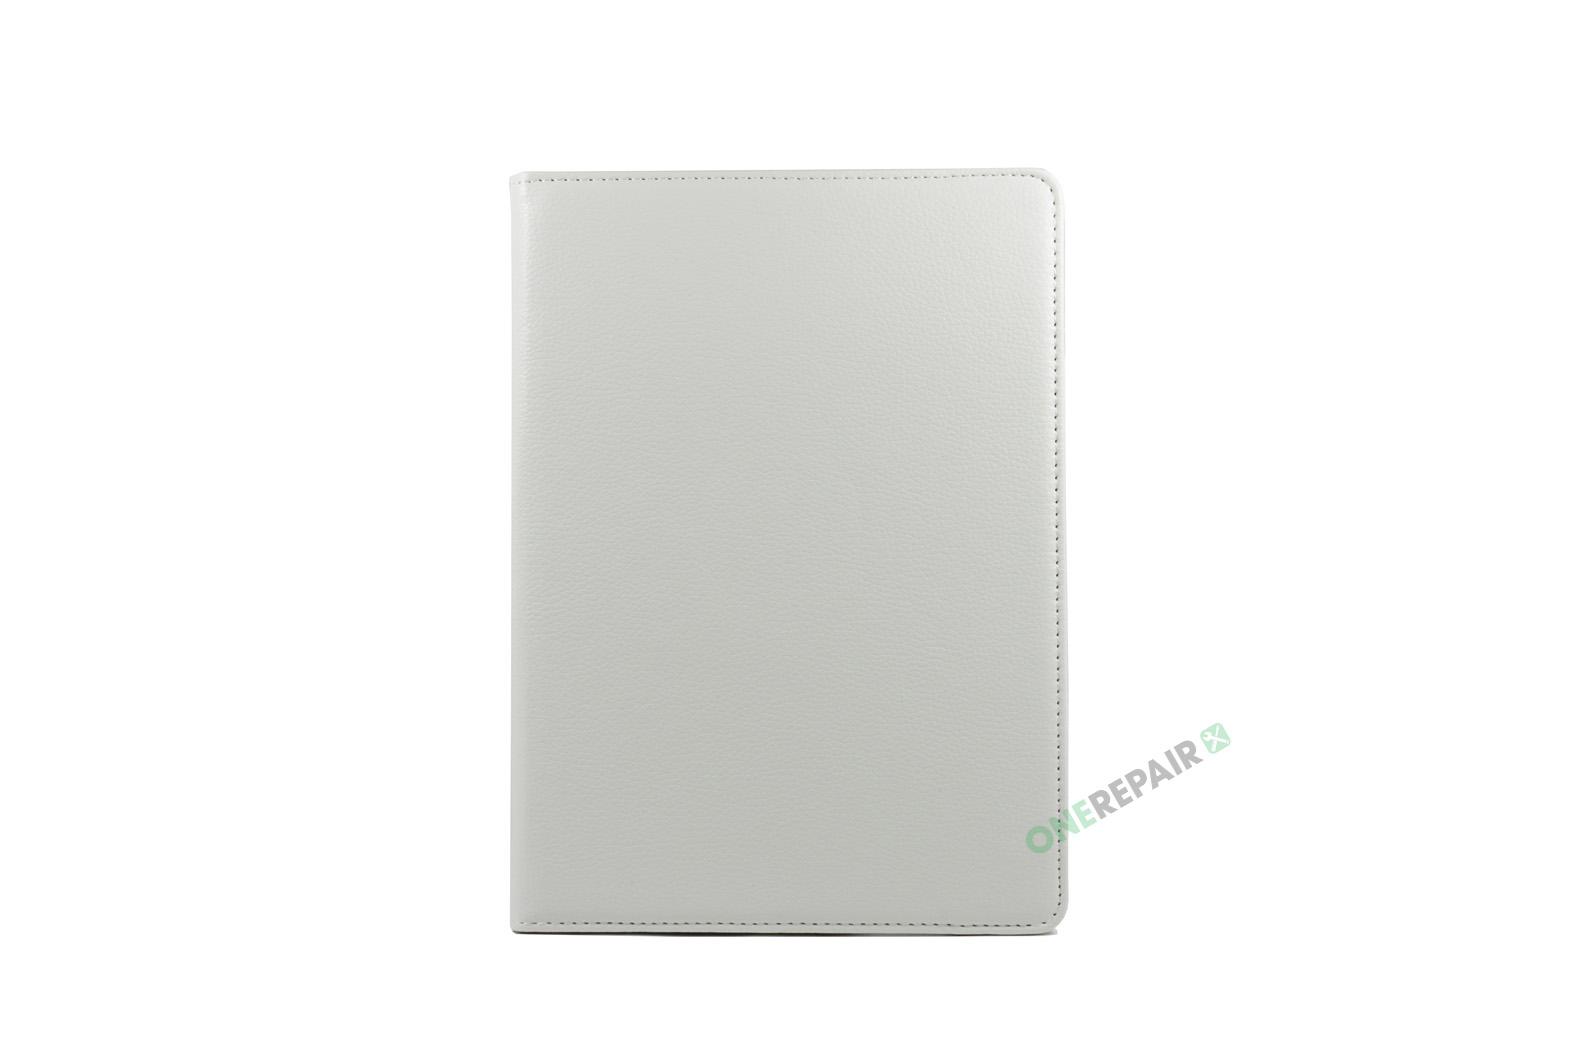 351055_iPad_Air2_2_A1566_A1567_Flipcover_Cover_Hvid_OneRepair_00002